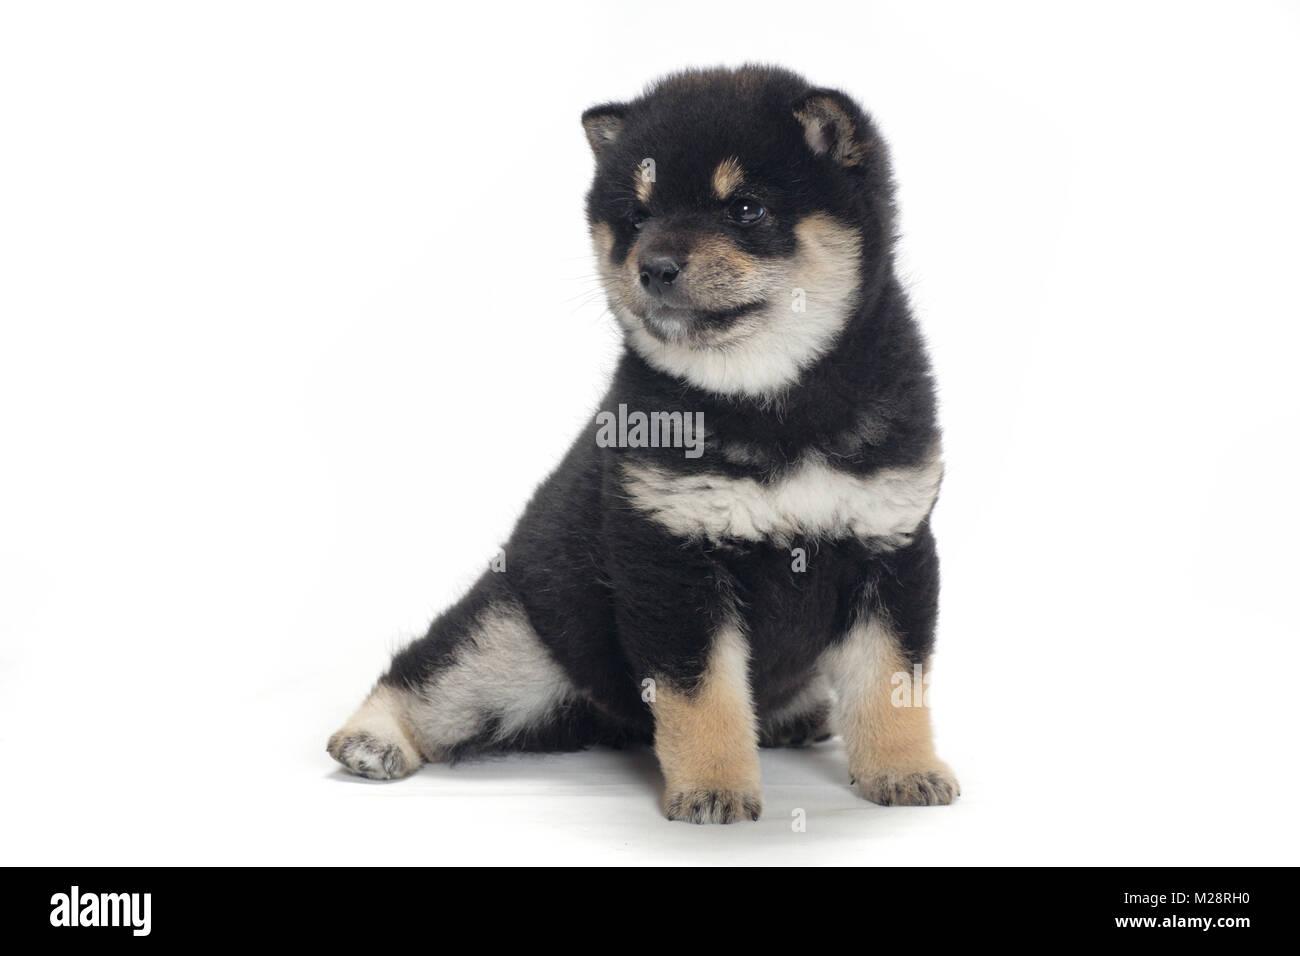 Shiba Inu Puppy Black And Tan Colour Stock Photo Alamy